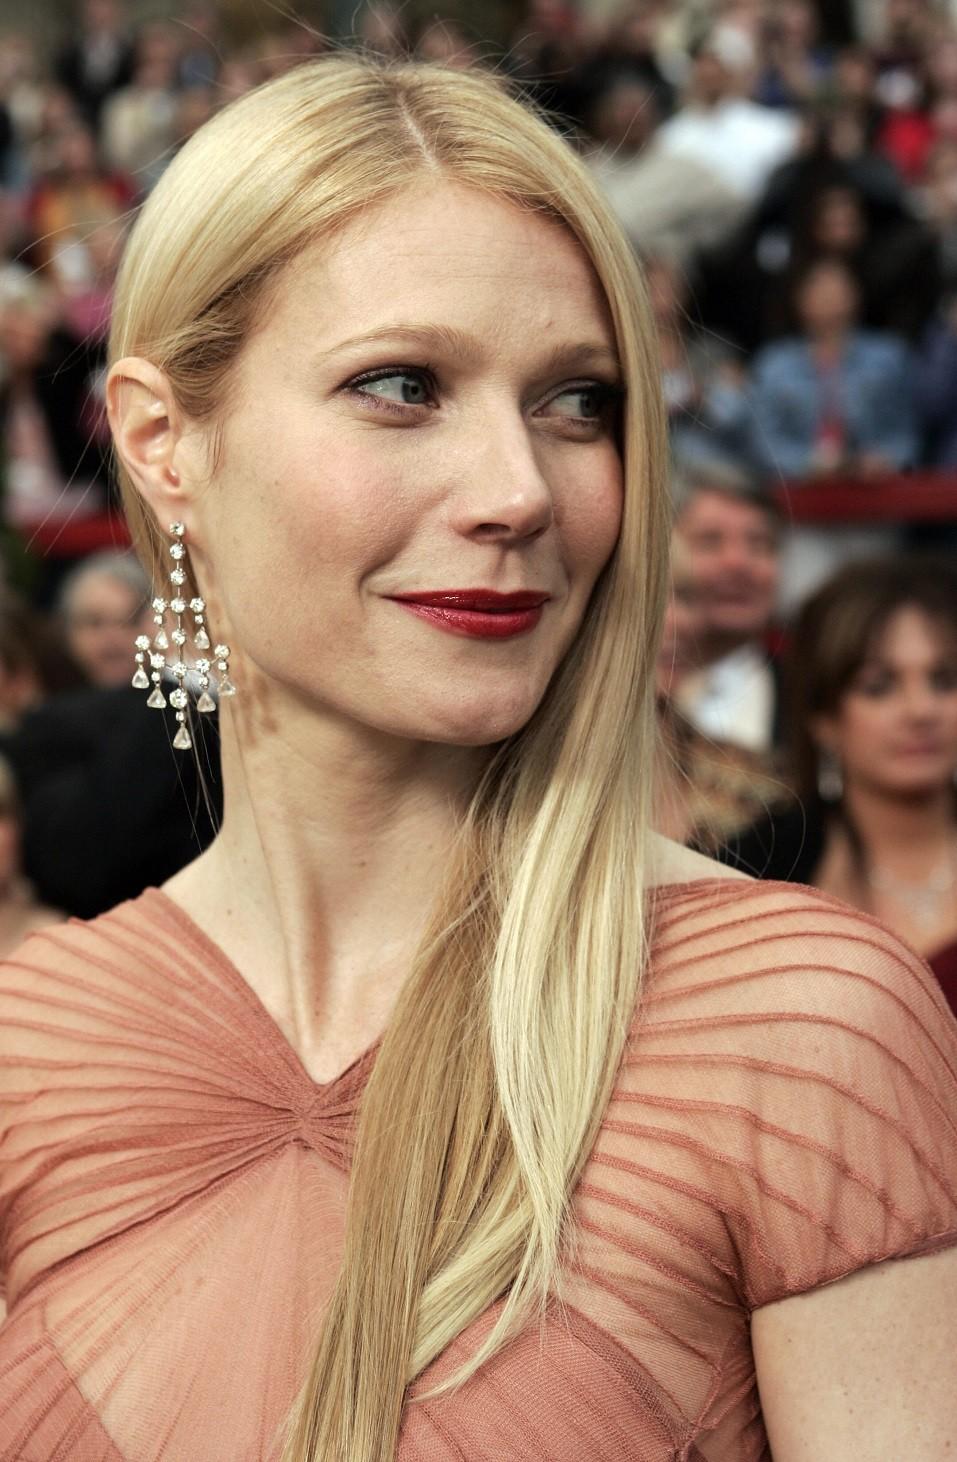 Academy Award winner Gwyneth Paltrow arrives at the 79th Academy Awards in Hollywood